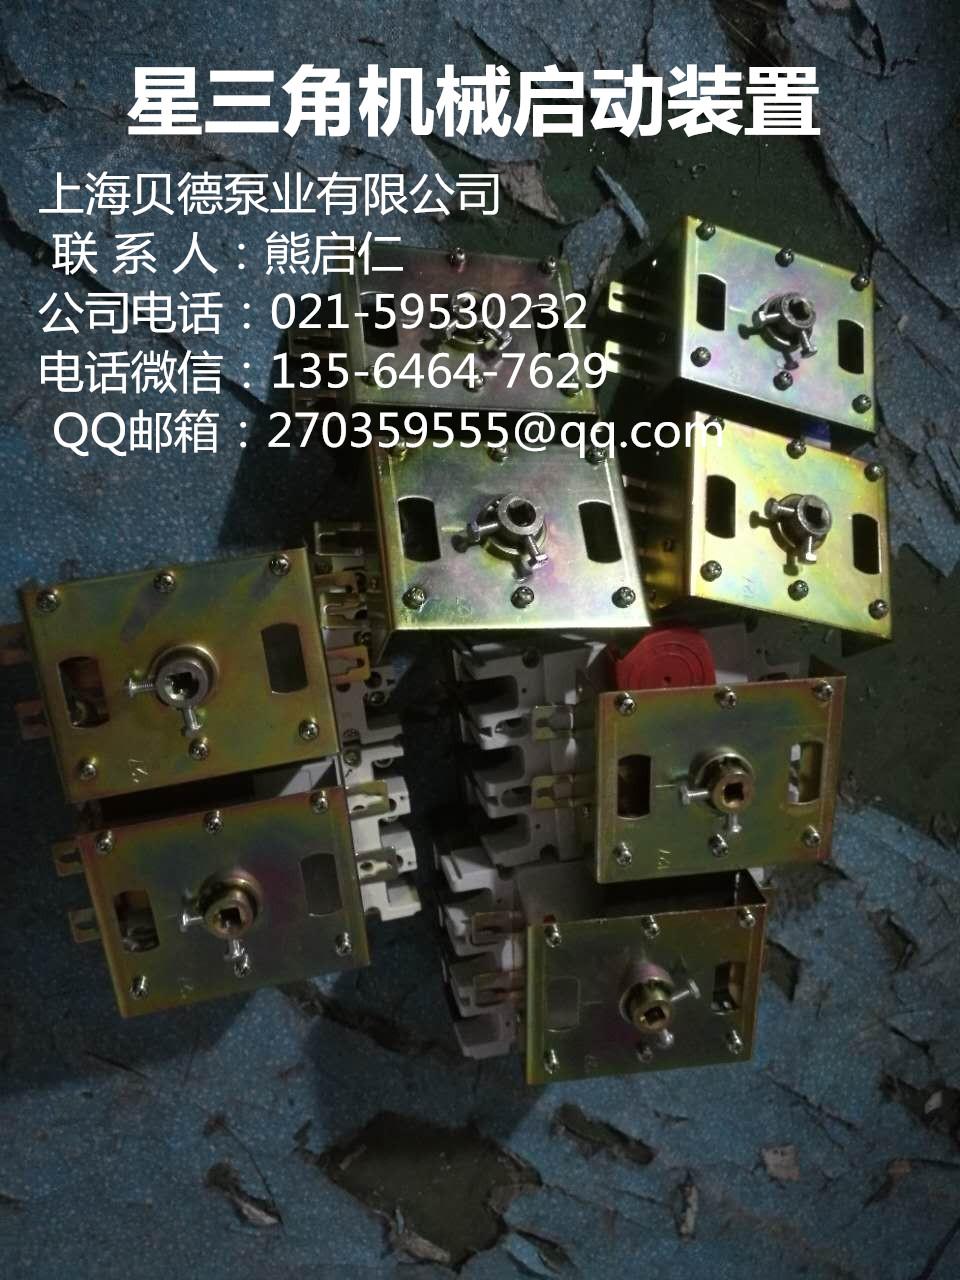 bdj-63m/800m-6-bdj-63m/800m-6星三角消防机械应急启动装置